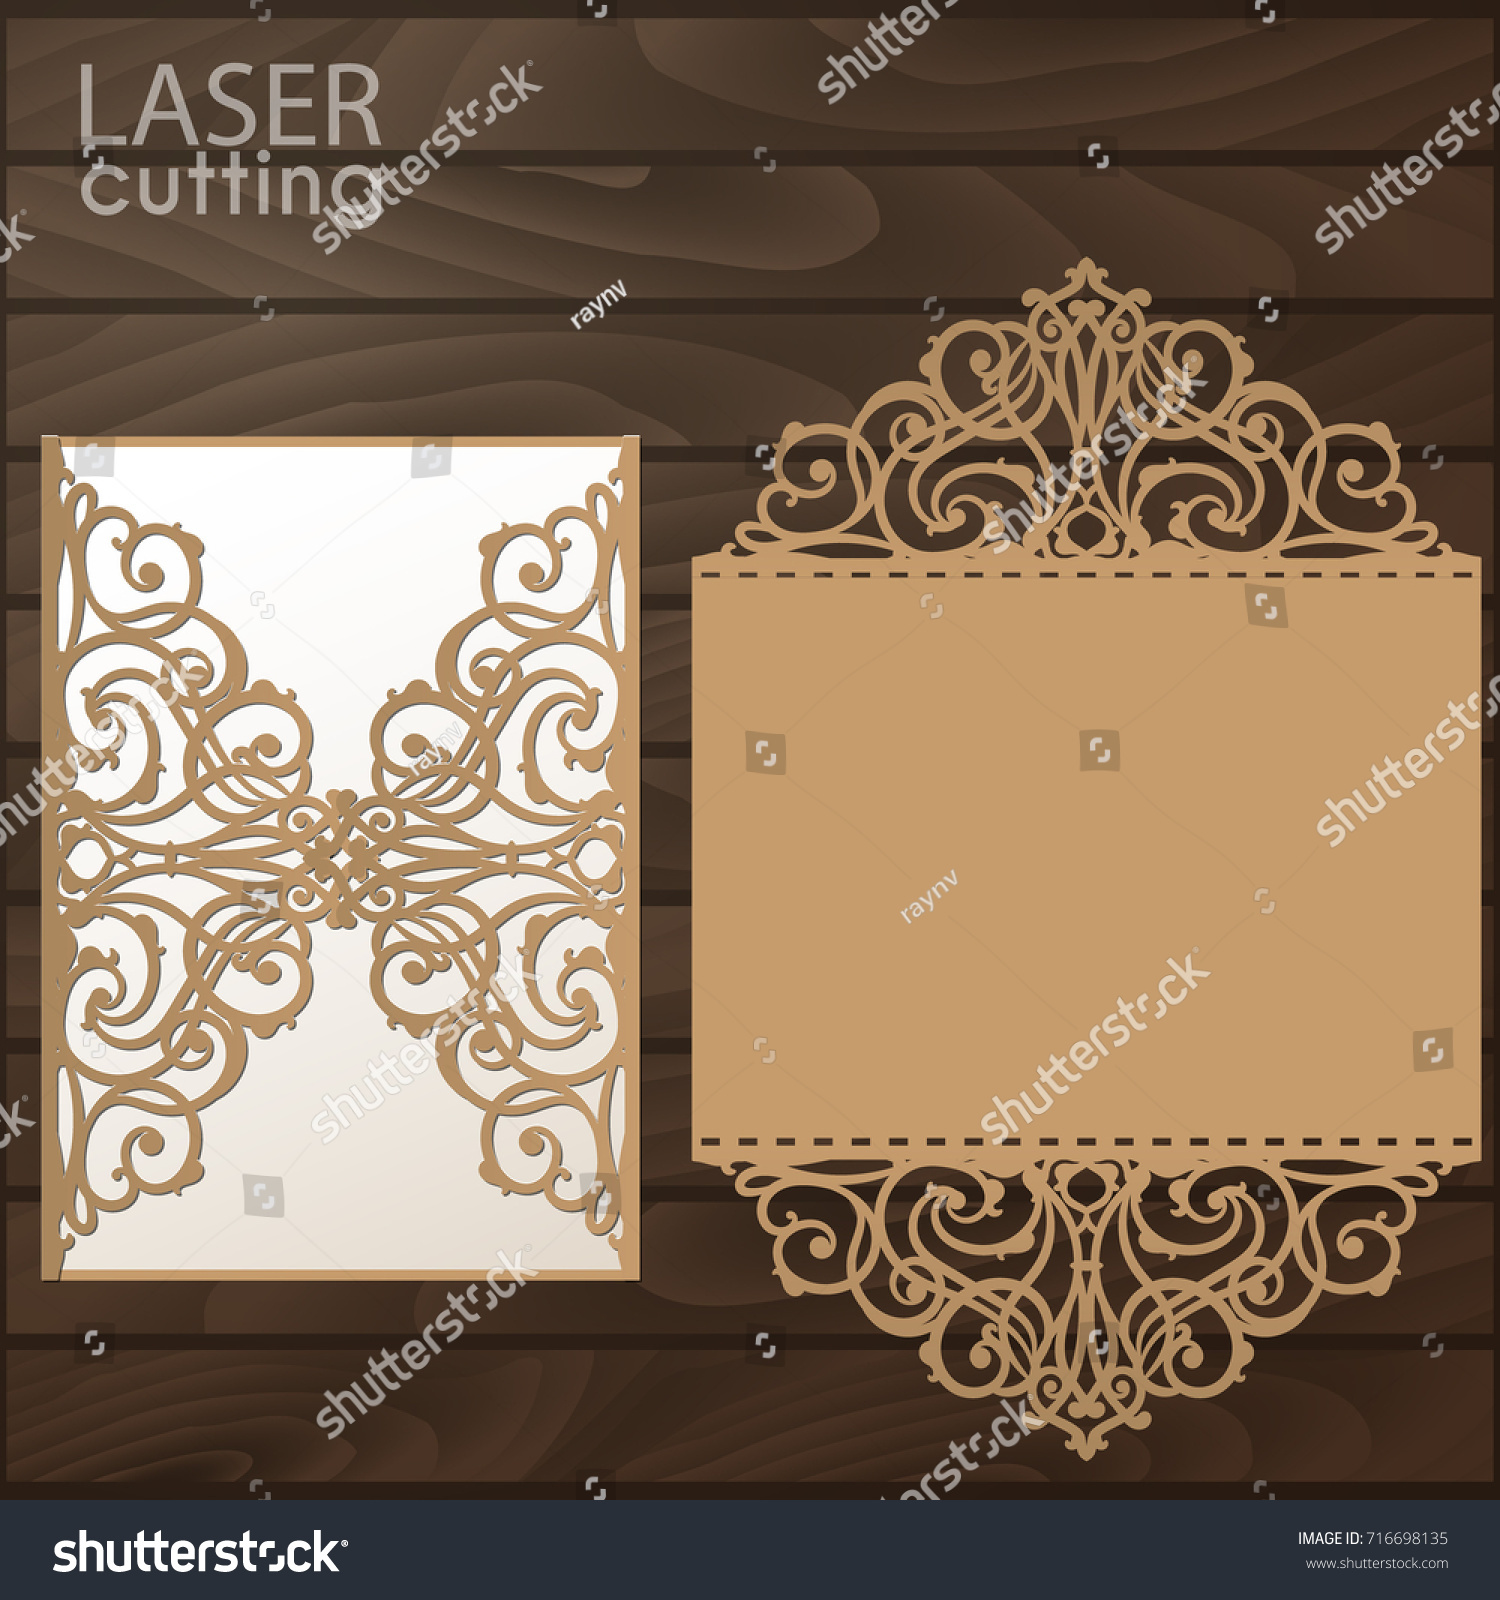 Laser Cut Wedding Invitation Card Template Stock Vector - Laser cut wedding invitation templates